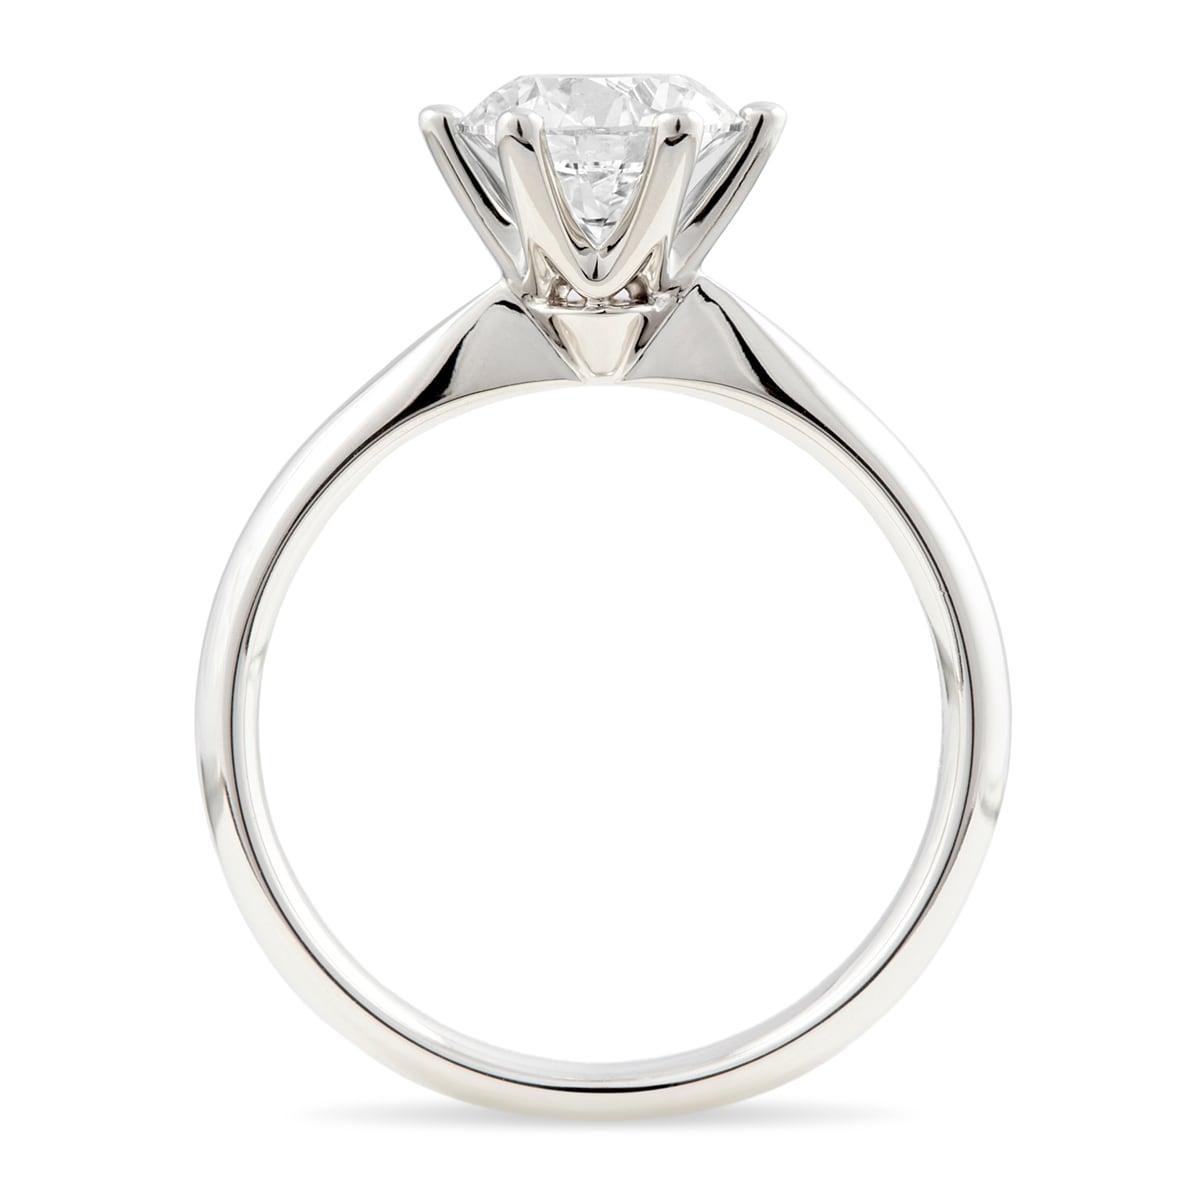 JSS_One_Carat_ring_RG_1,5ct_på_sidan_JS_121116_13129